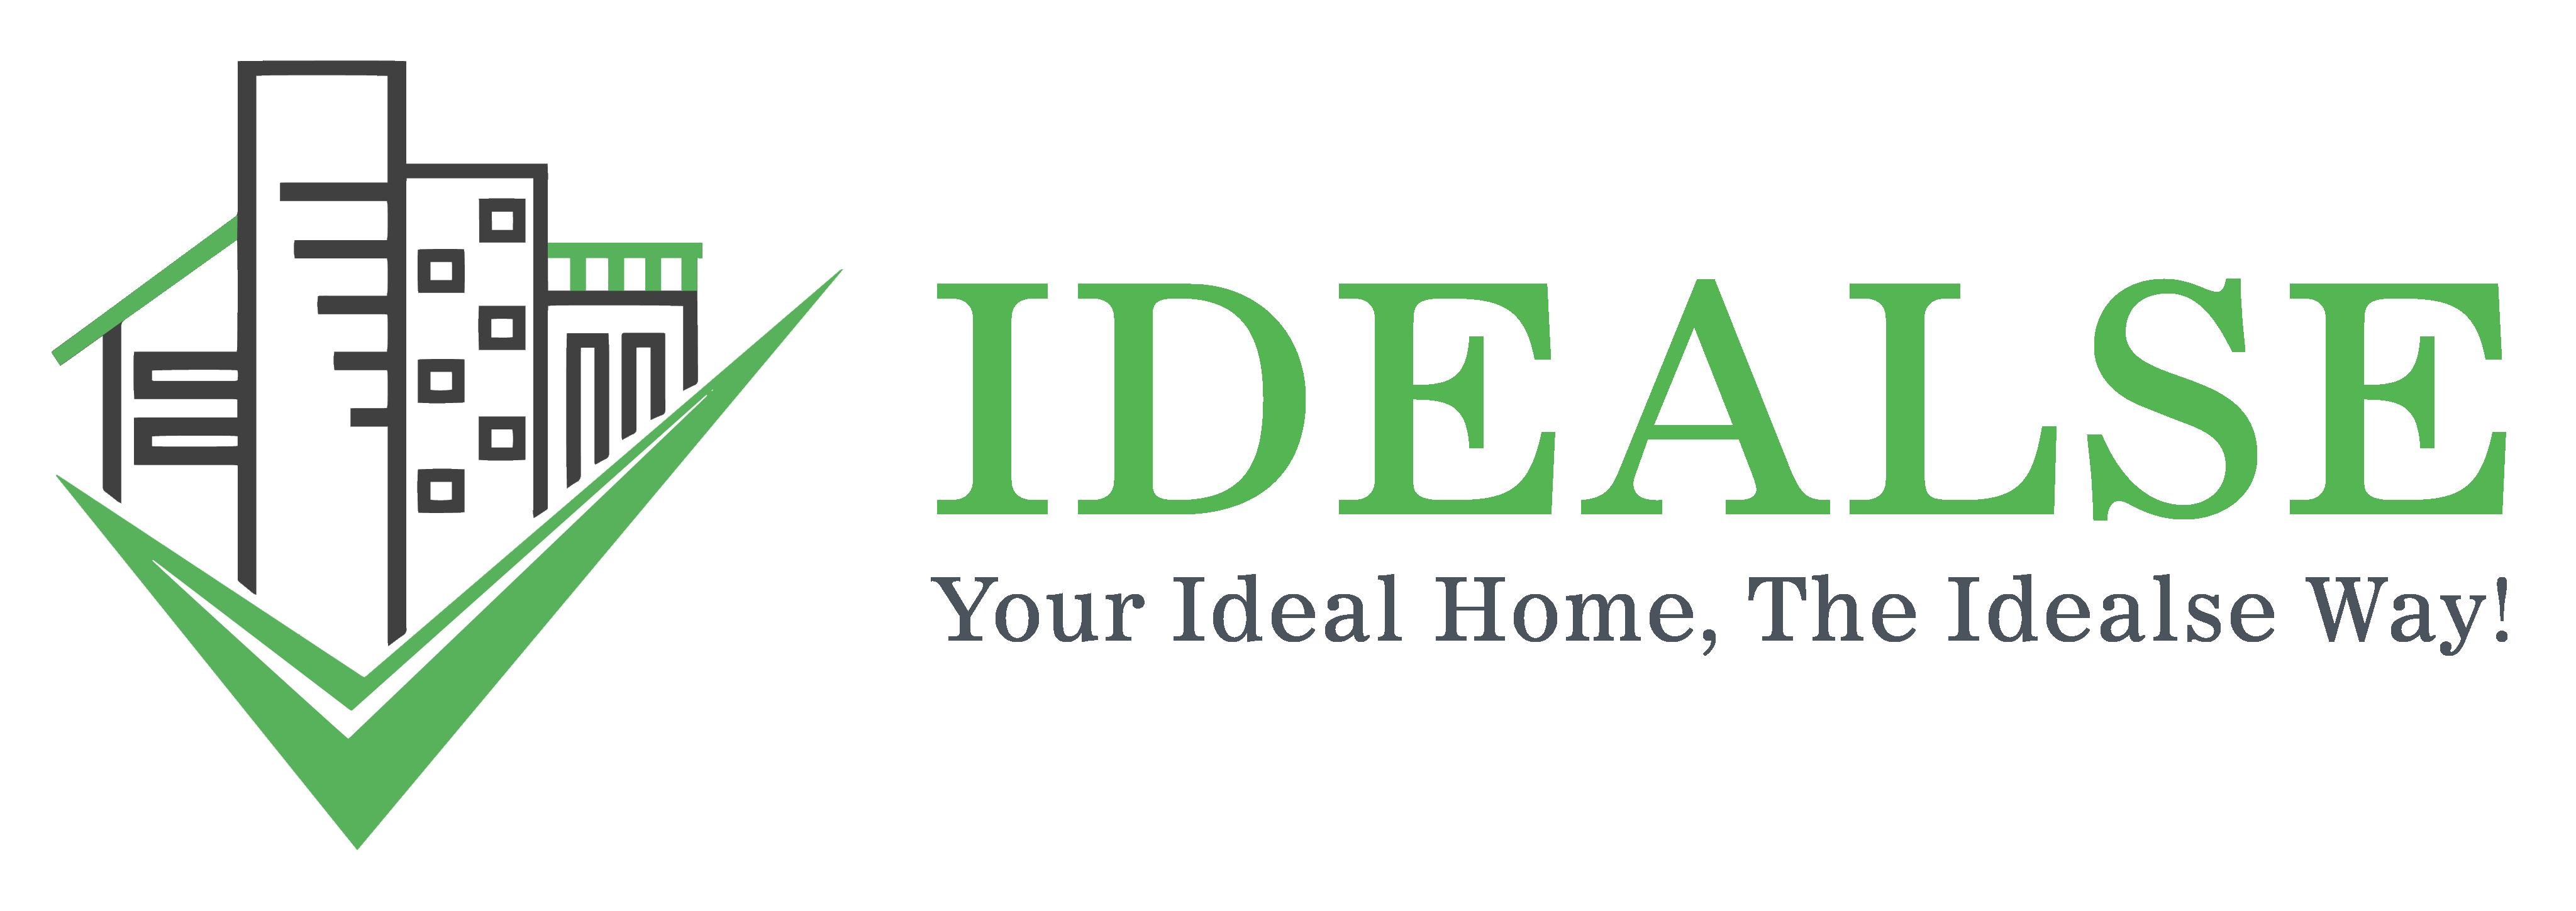 Idealse | Your Ideal Home, The Idealse Way!